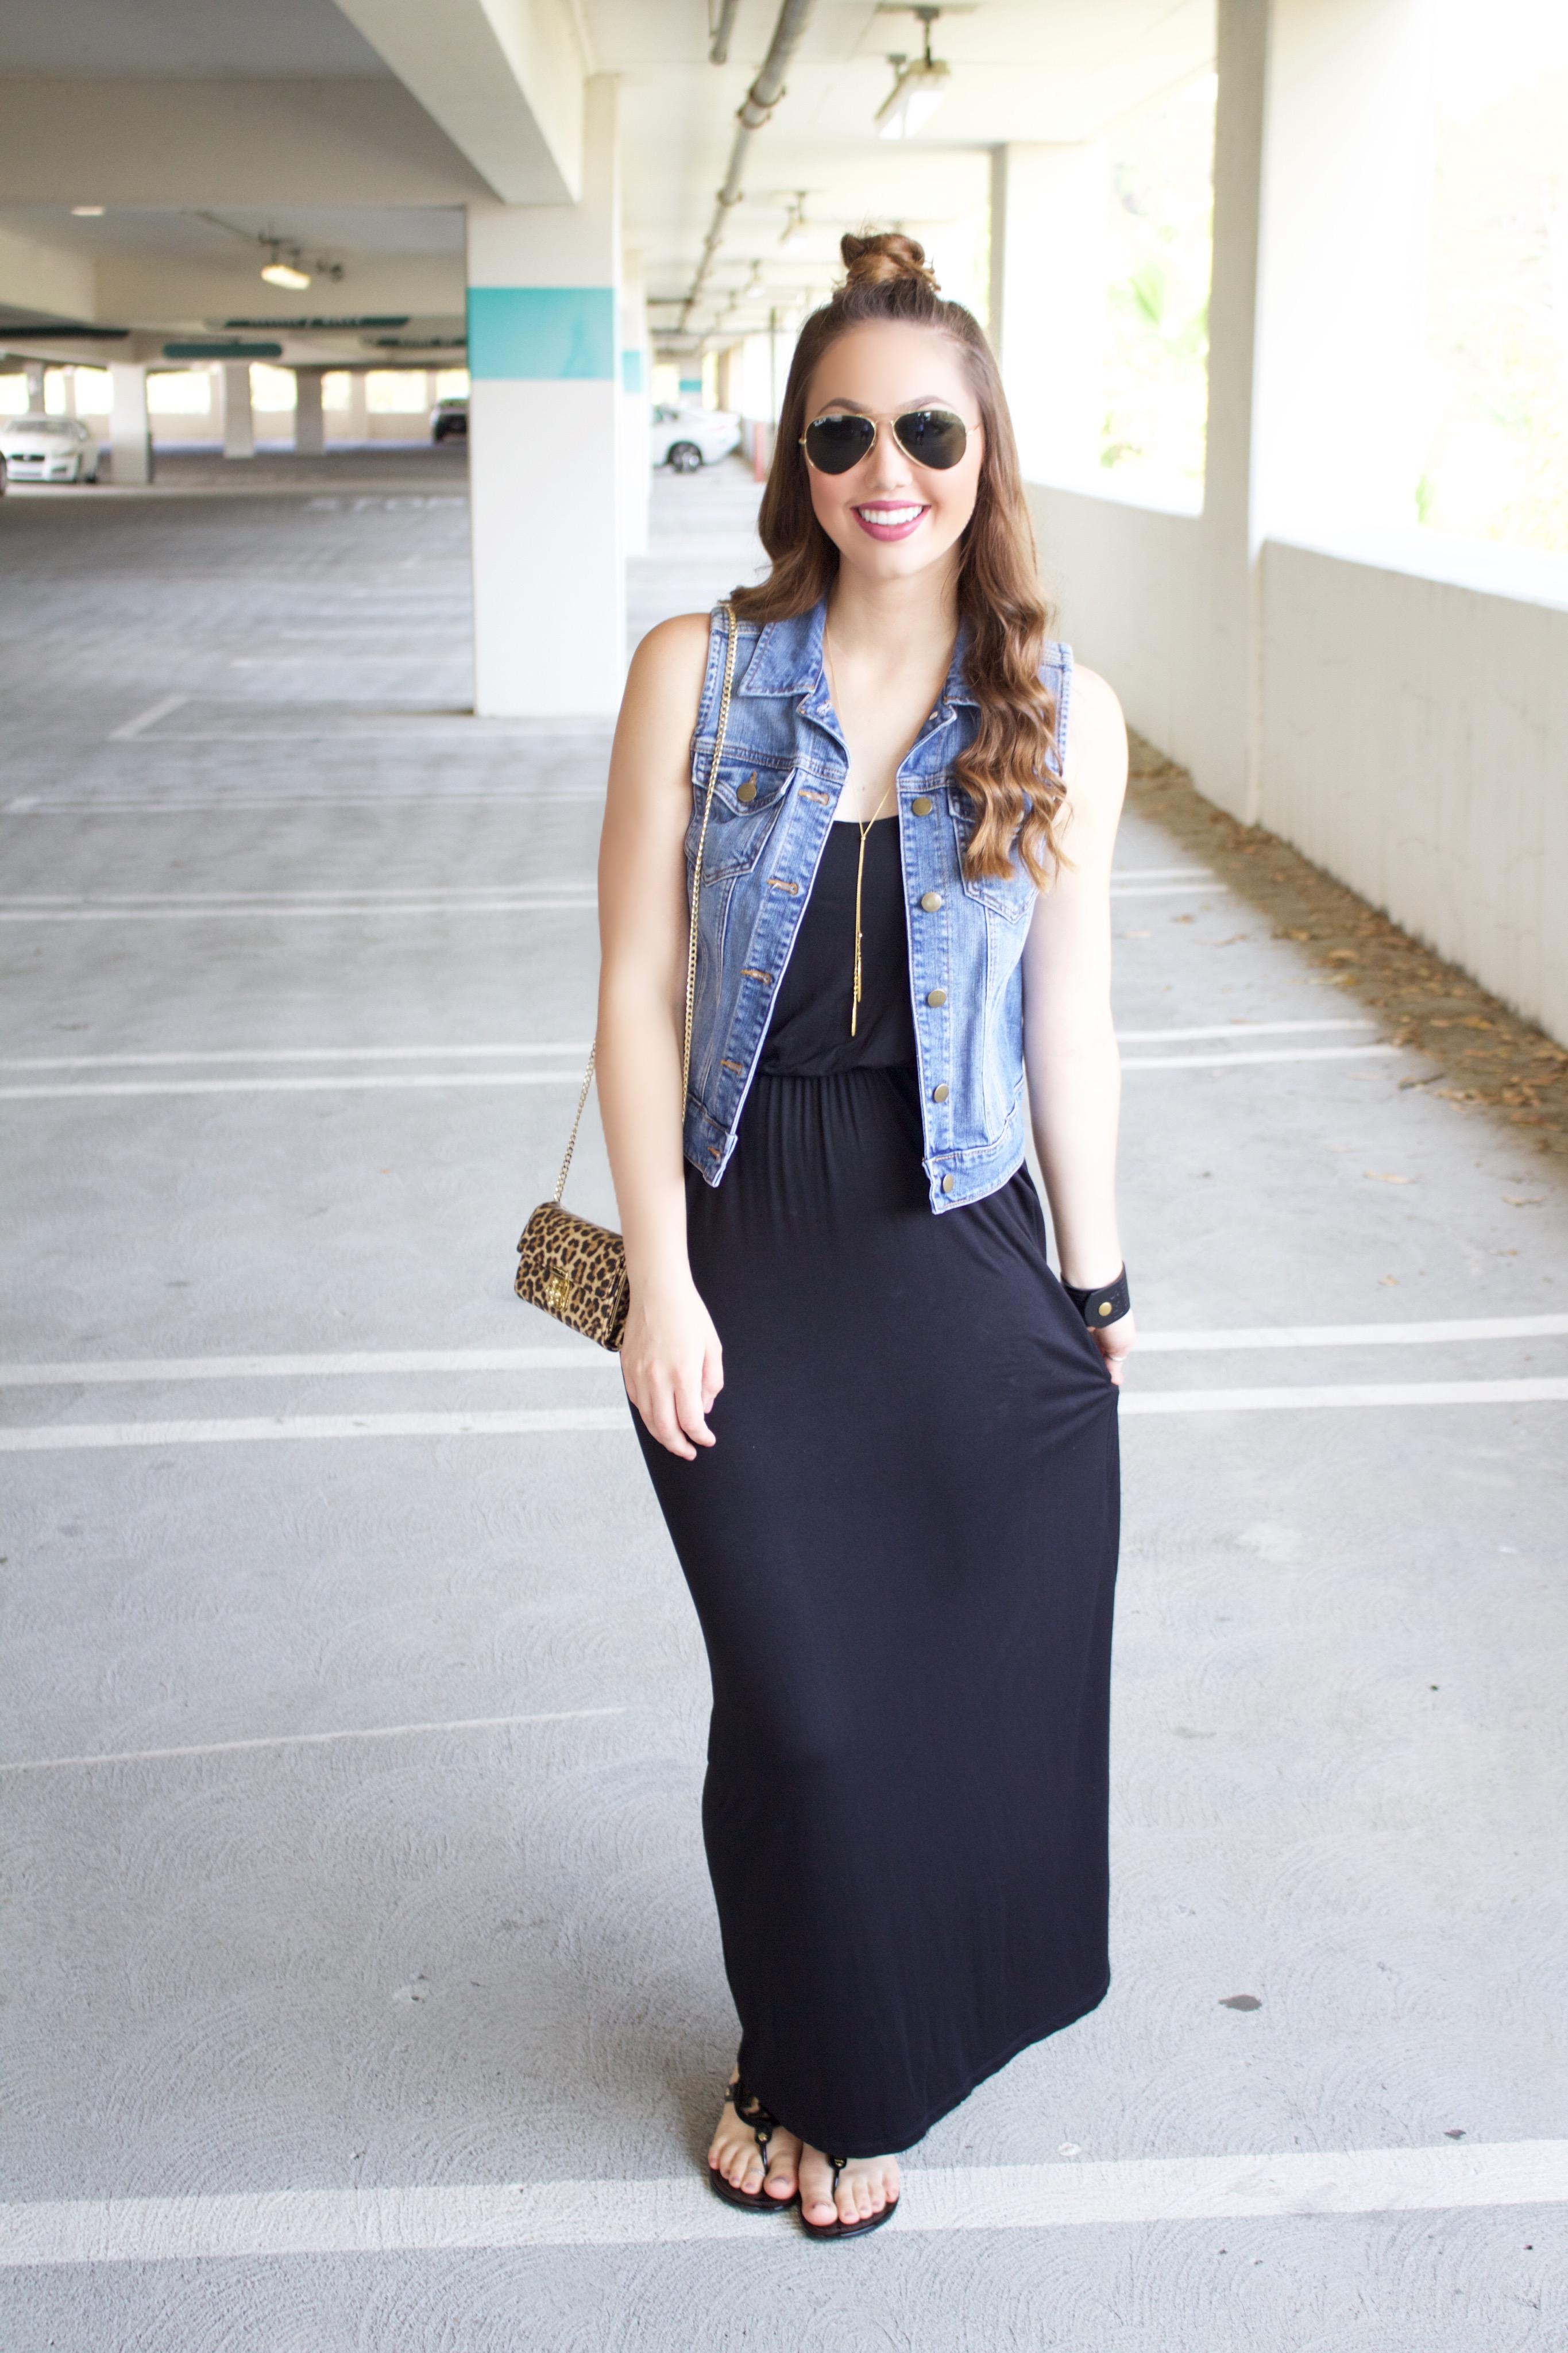 Black Maxi Dress - My Styled Life